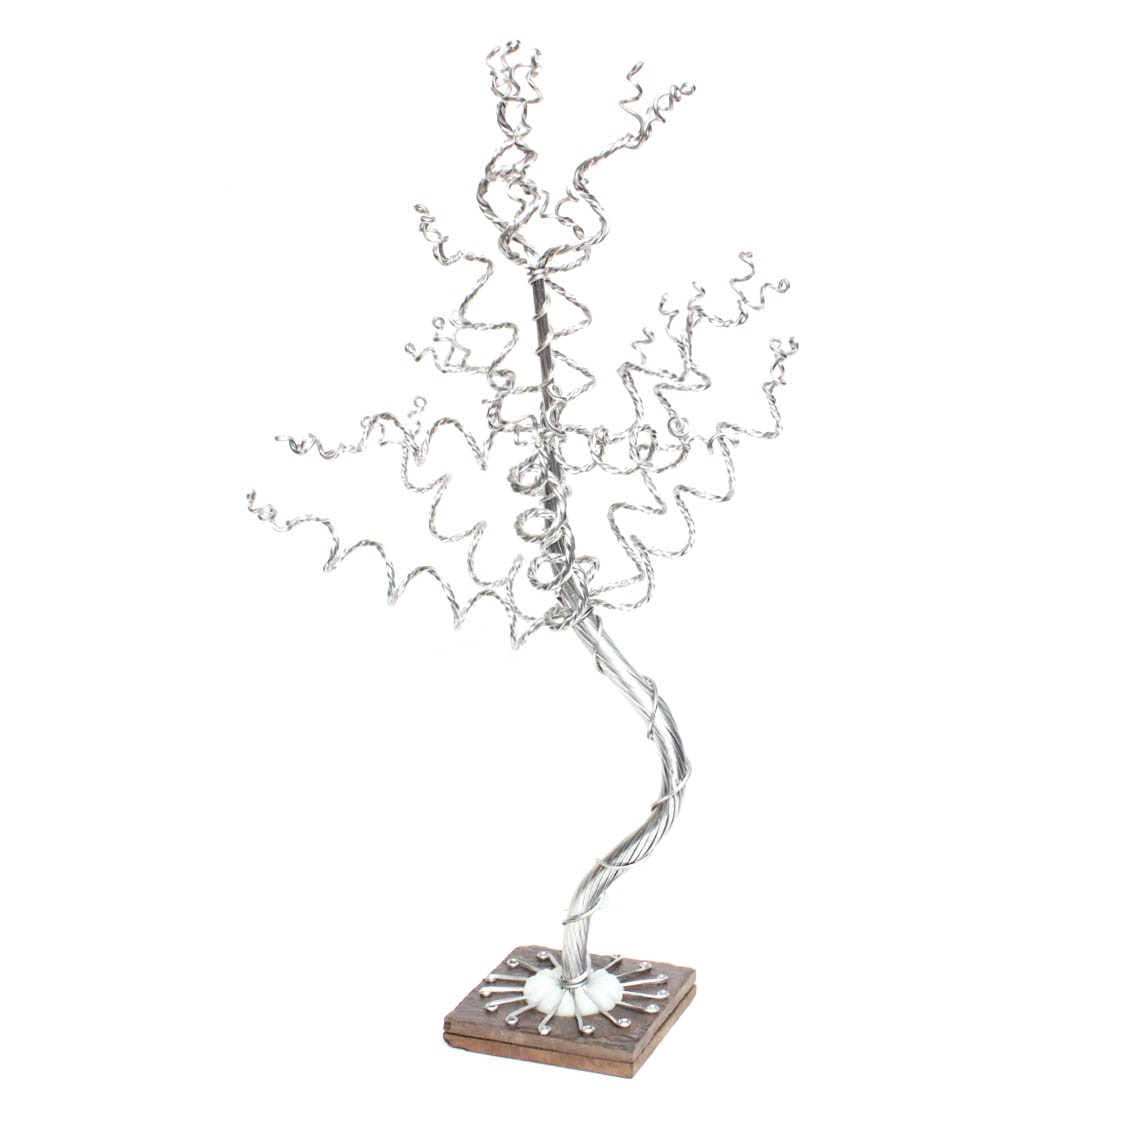 Braided Aluminum Wire Tree Sculpture